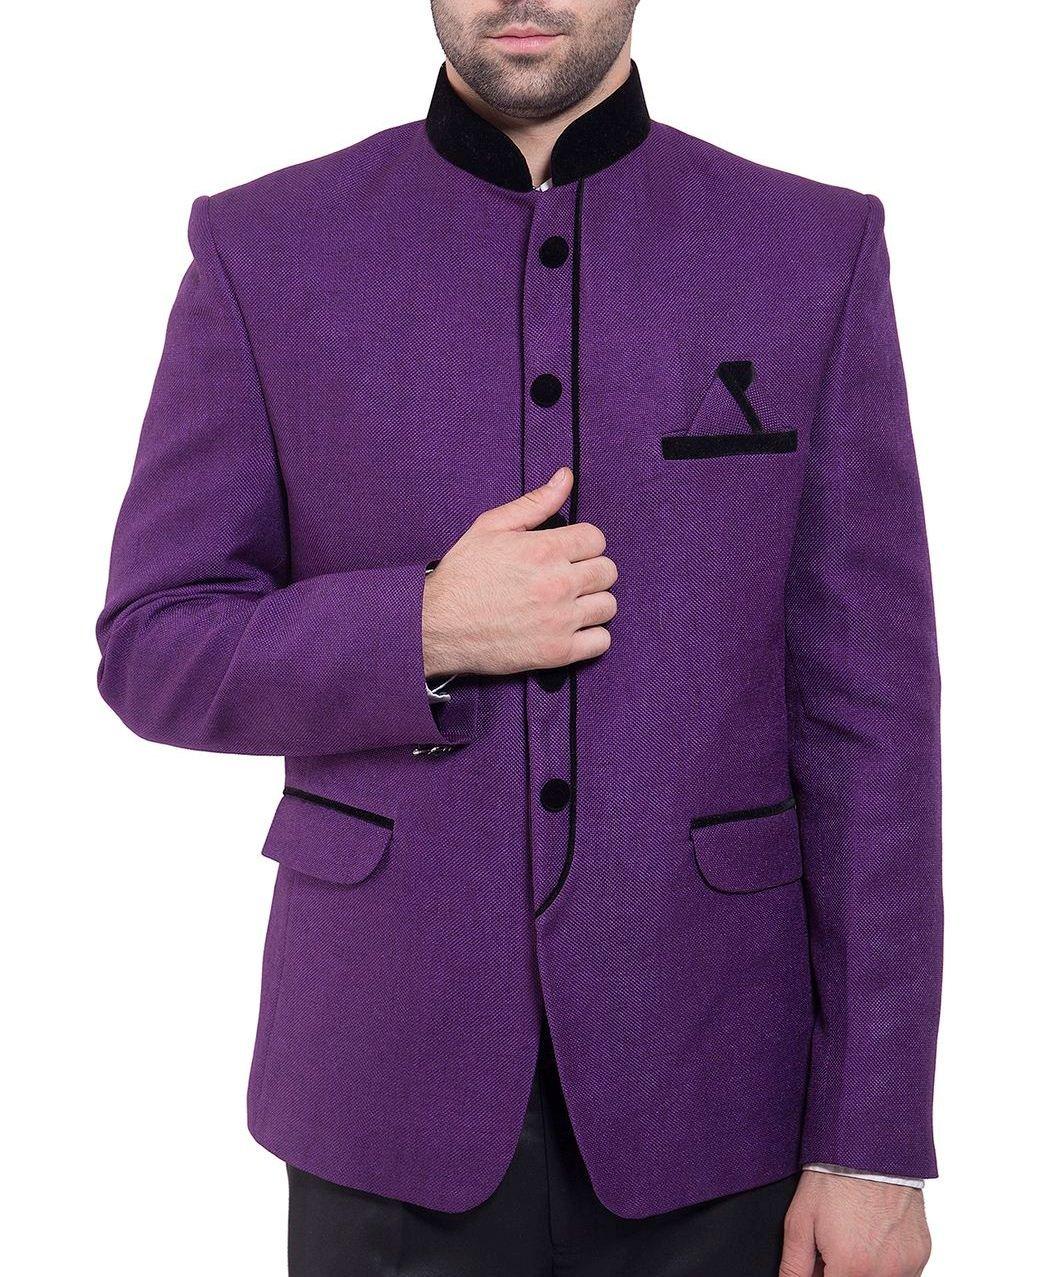 WINTAGE Men's Rayon Cotton Bandhgala Festive Nehru Mandarin Blazer- Twenty Colors